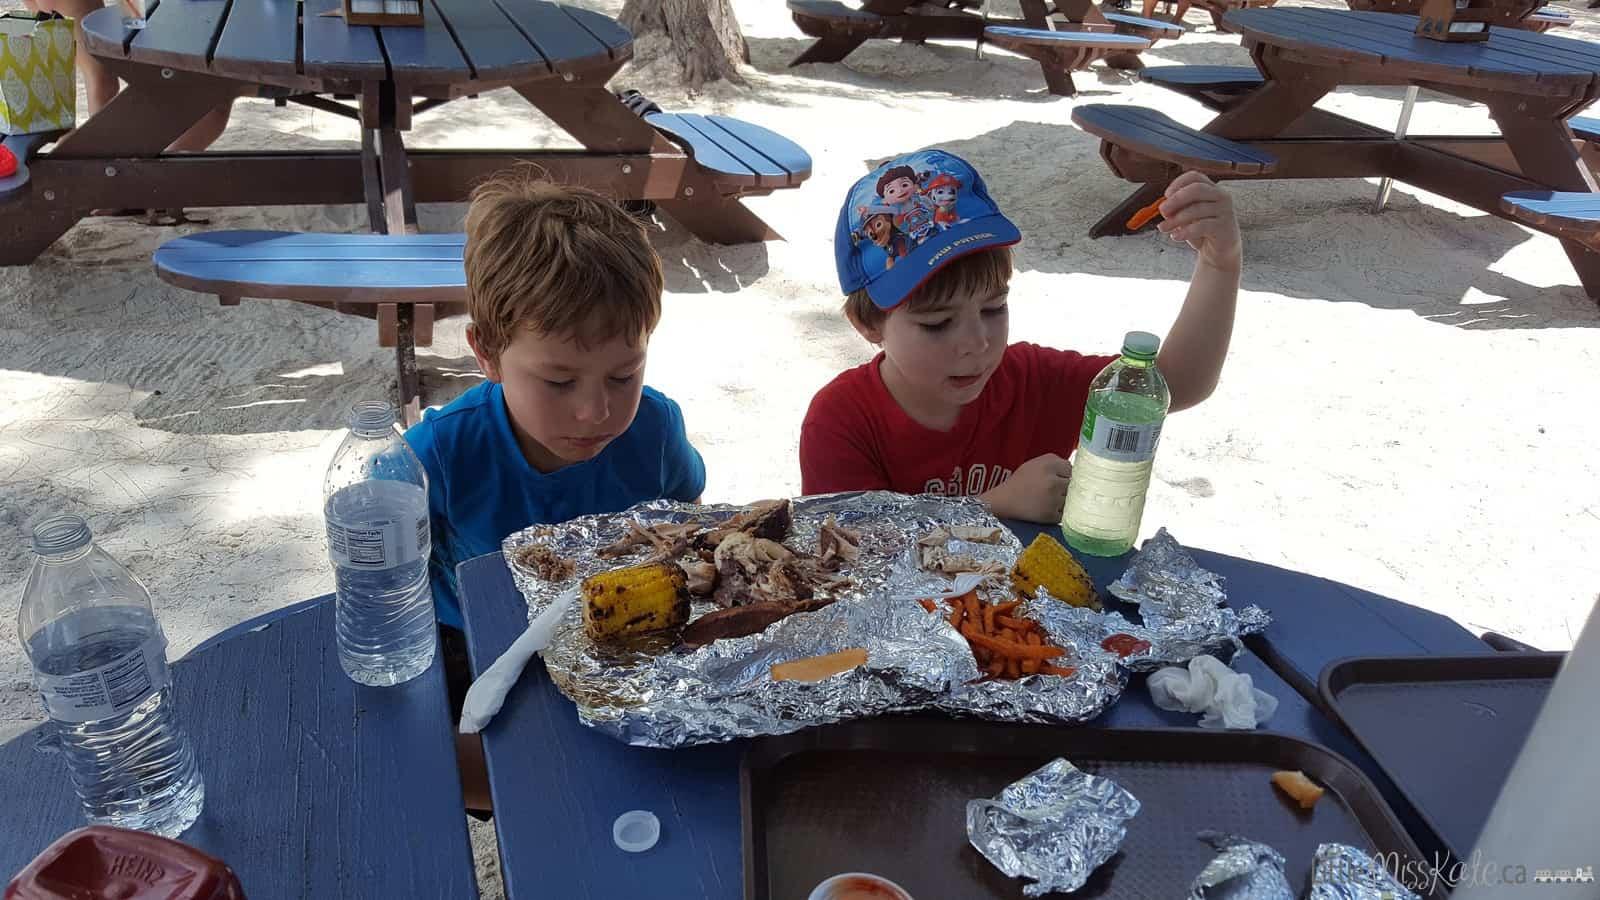 Beaches Resort Villages Turks and Caicos Restaurants - The Jerk Shack via littlemisskate.ca